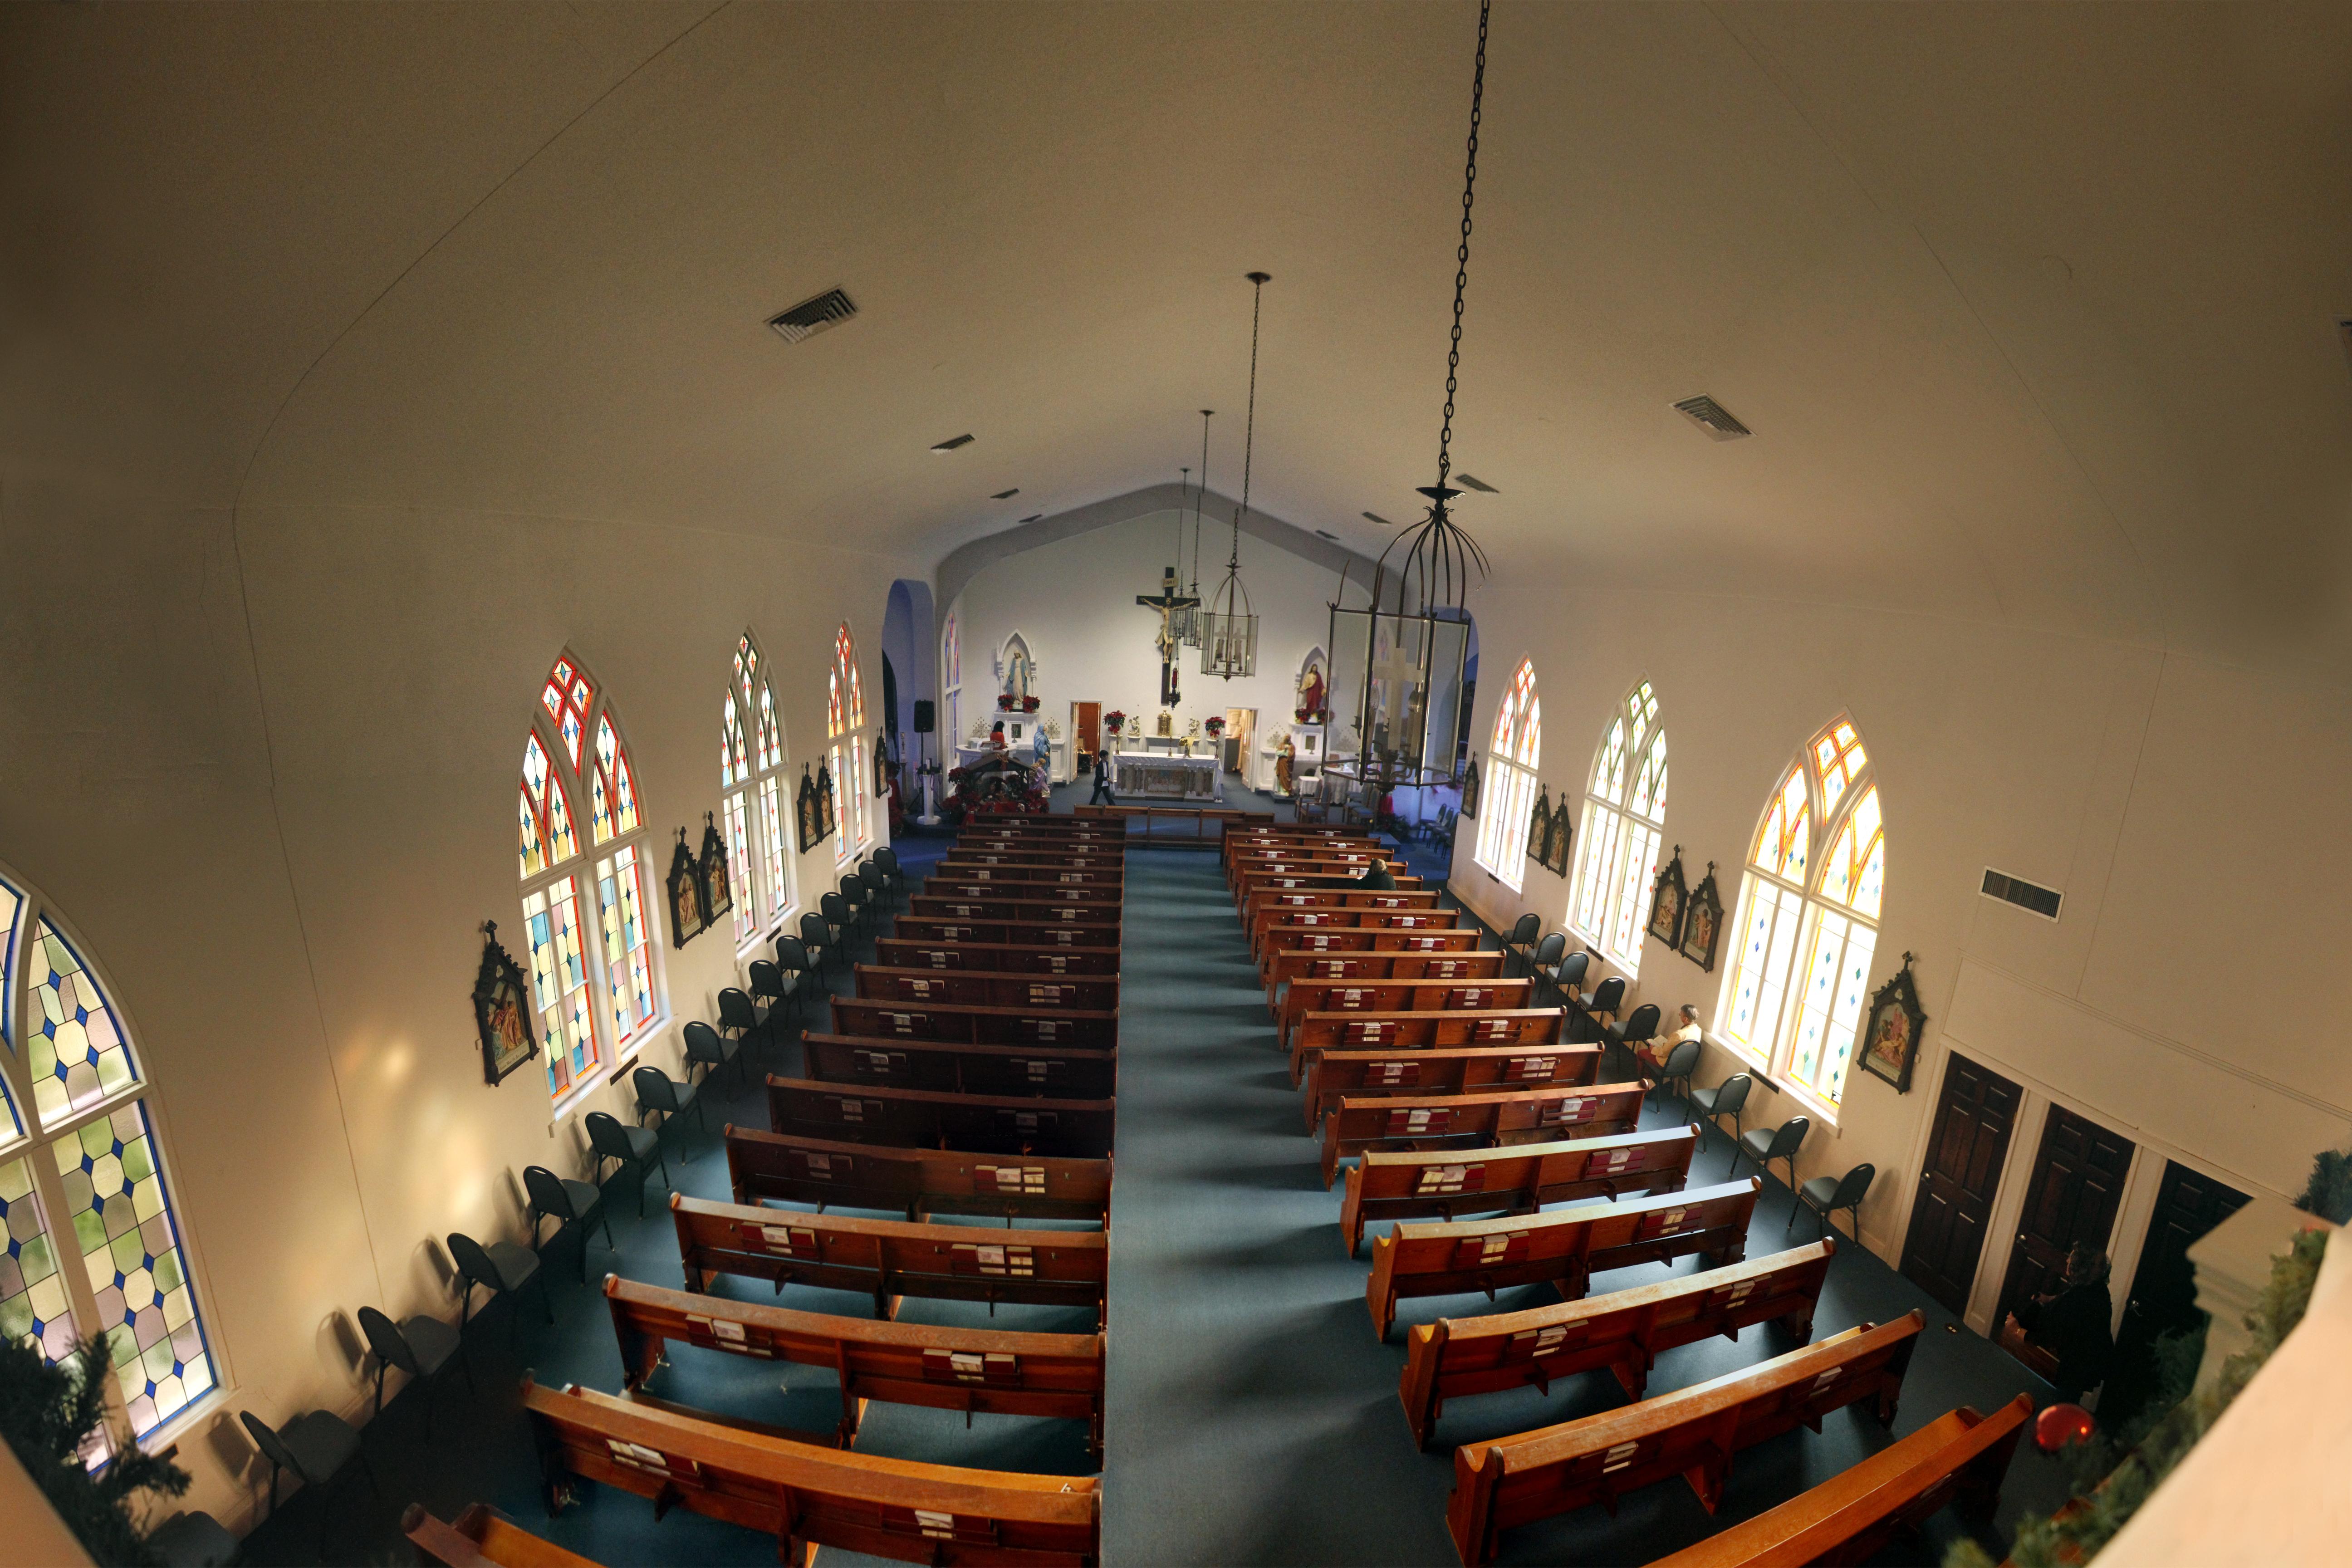 12-31-12 Panorama